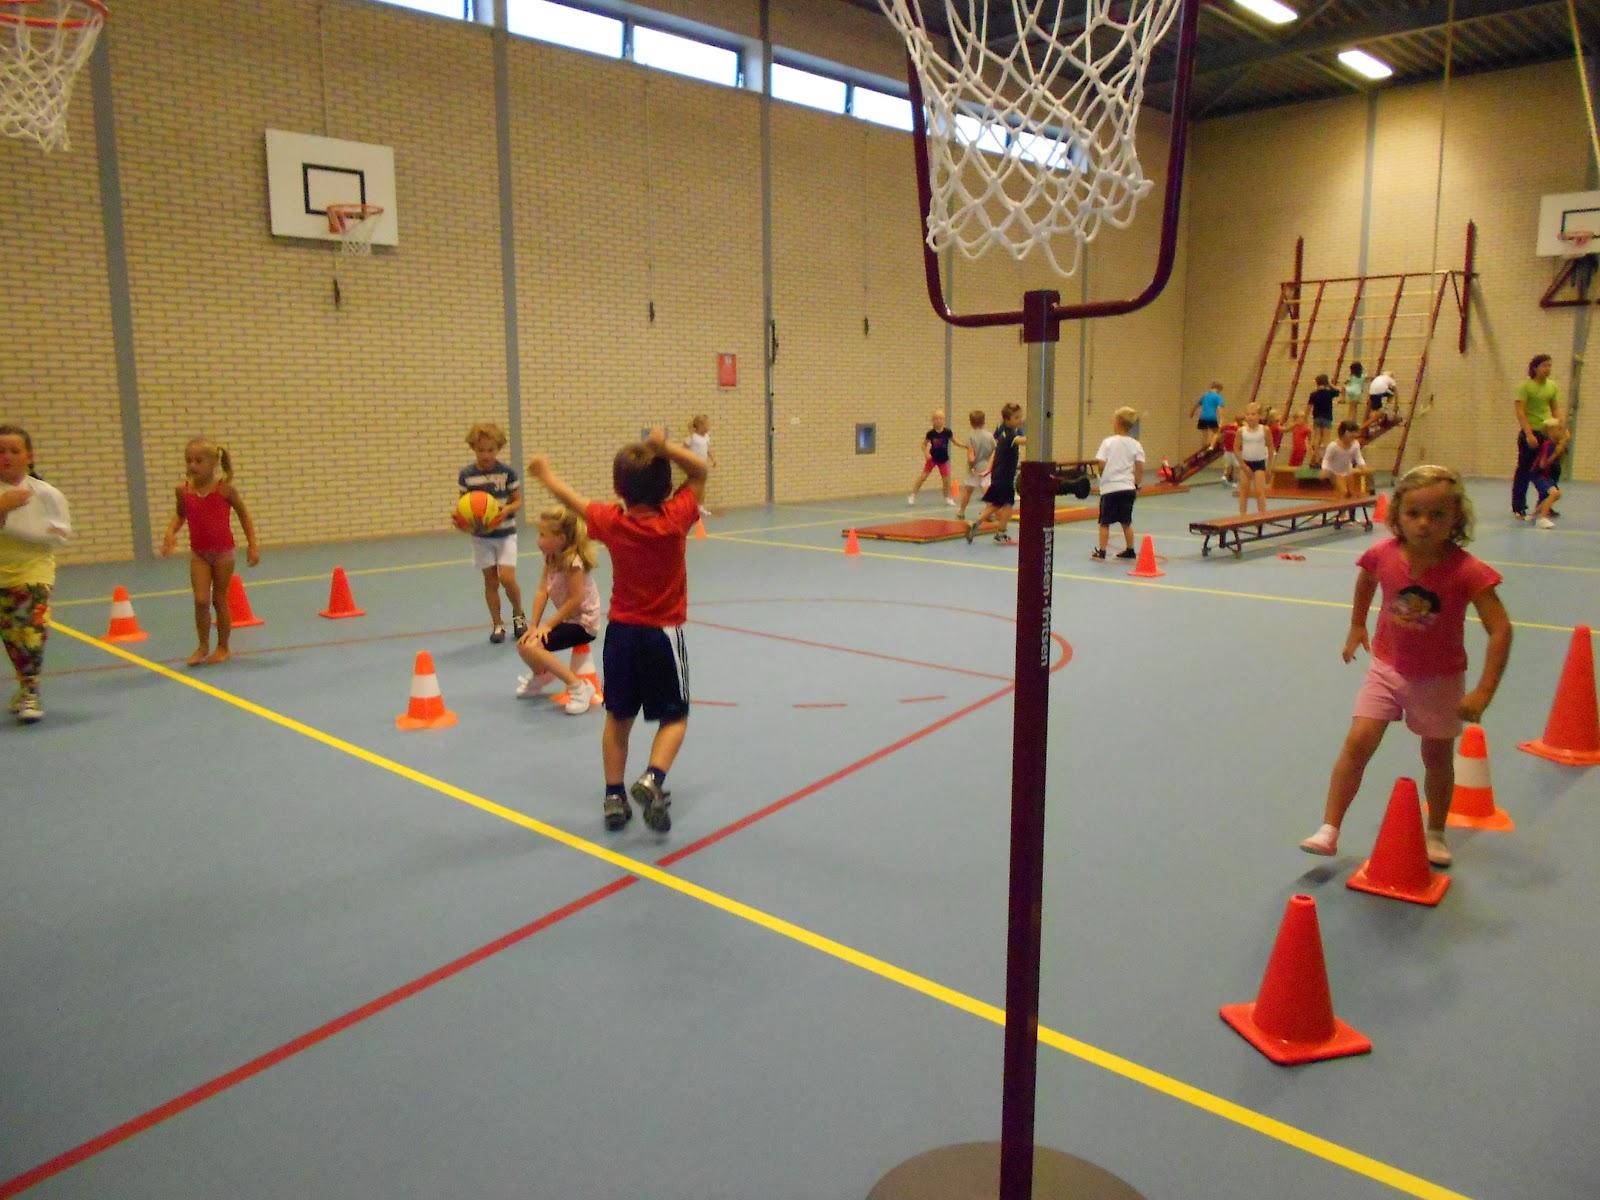 Vaak Geliefde Basketbal Spelletjes Gym @KOF89 - AgnesWaMu #SJ83